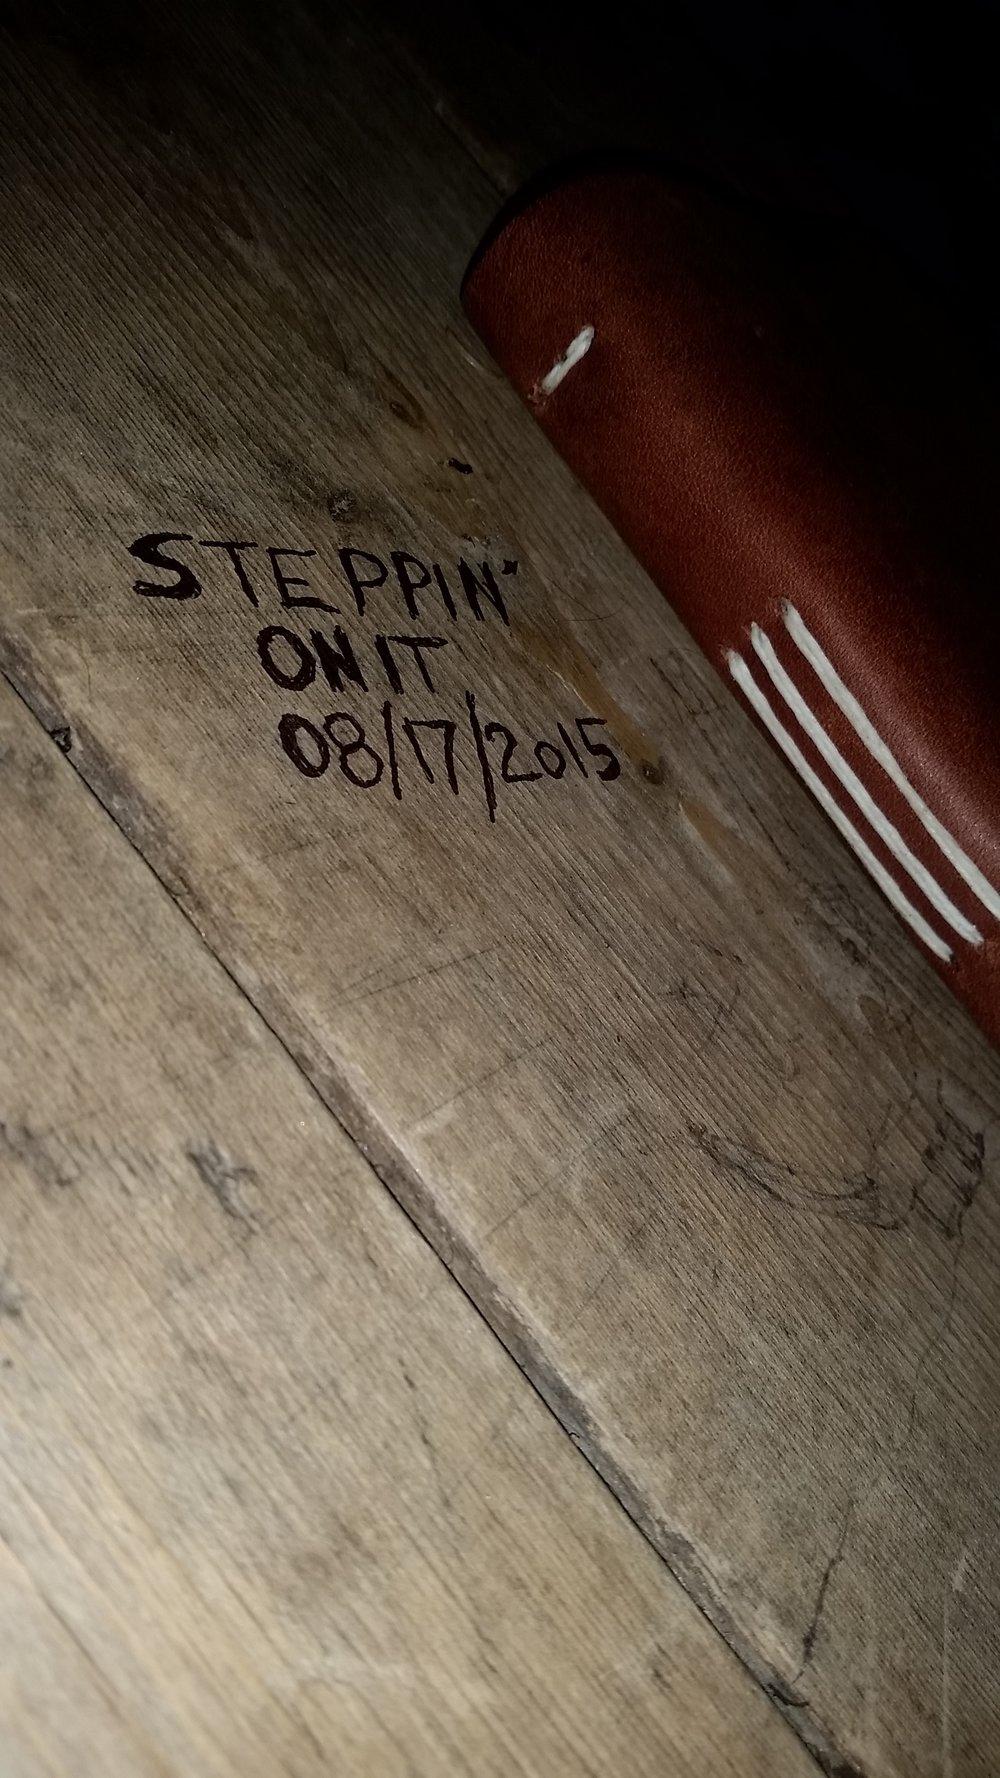 Steppin On It - Journal.jpg